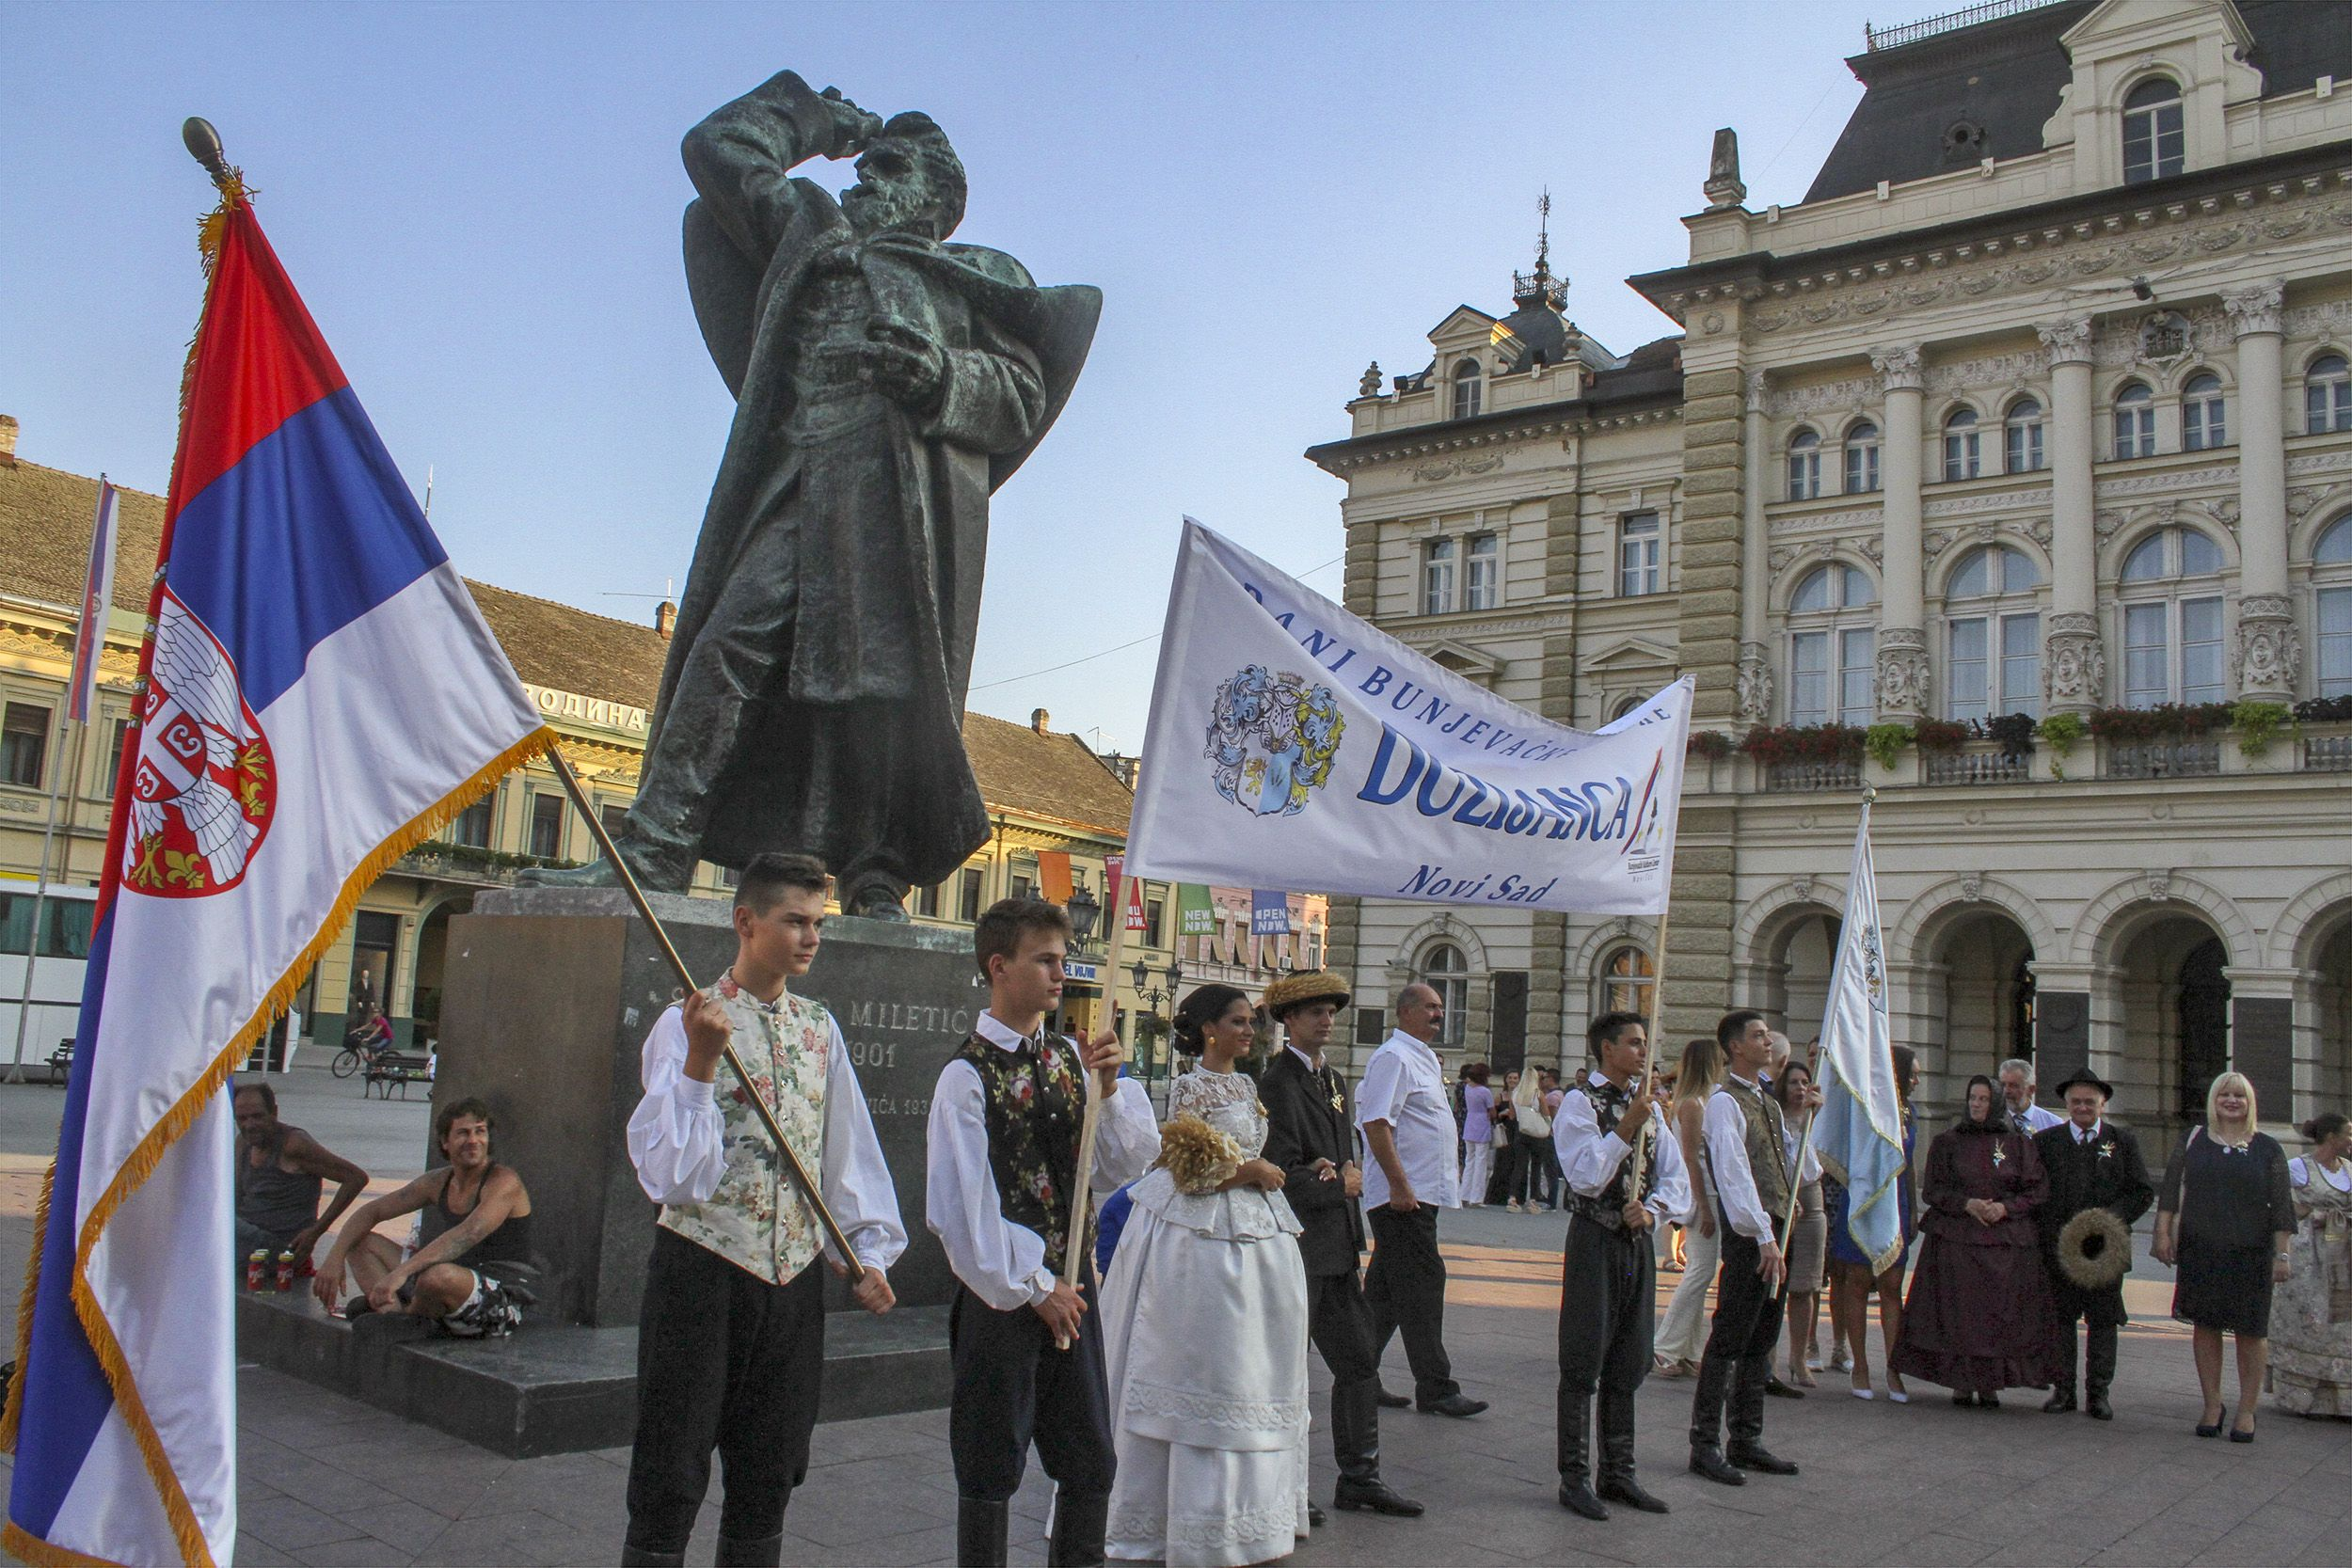 https://www.dnevnik.rs/sites/default/files/2019-08/duzijanca08j.jpg